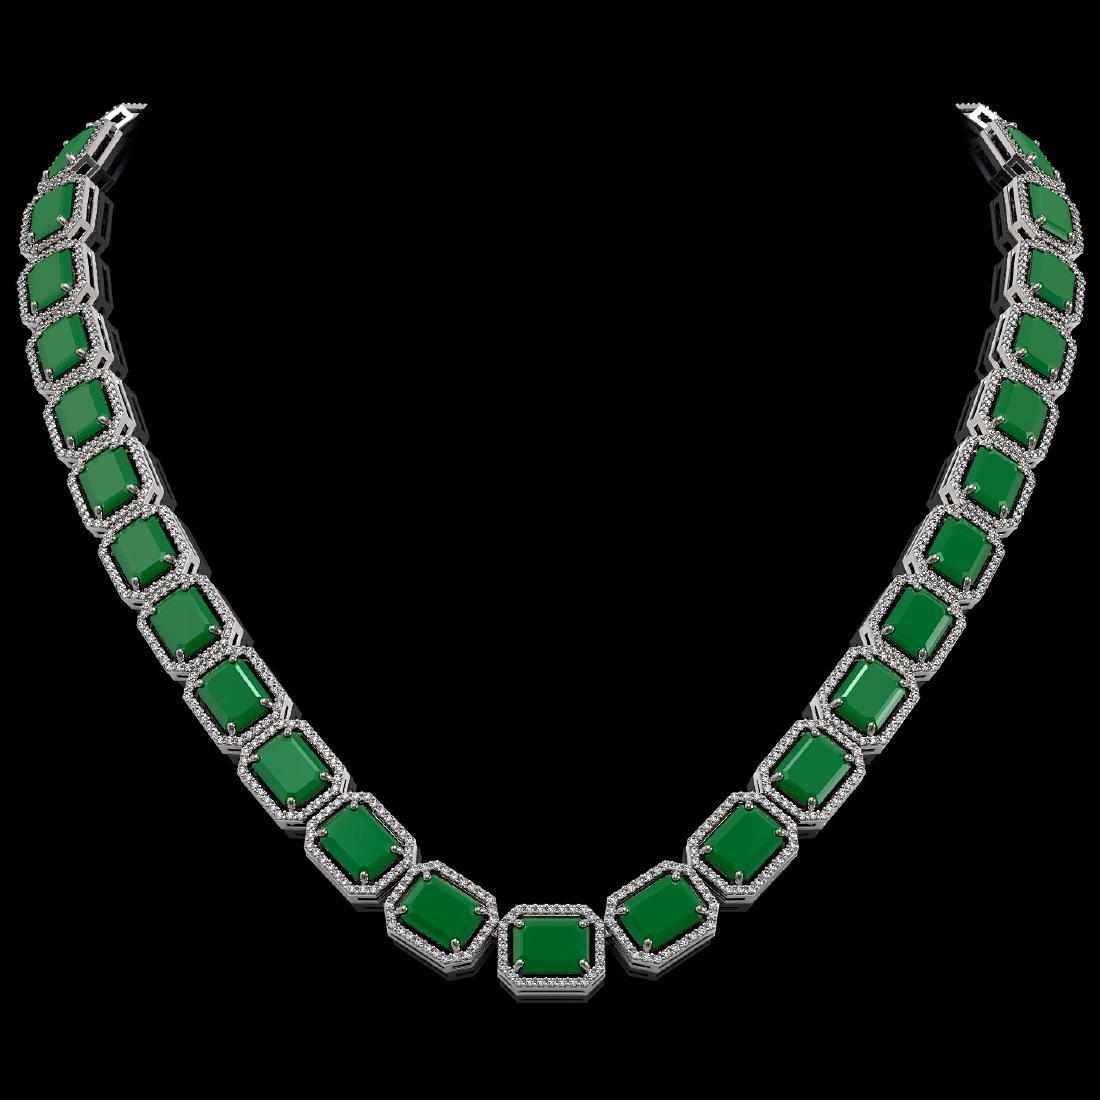 84.94 CTW Emerald & Diamond Halo Necklace 10K White